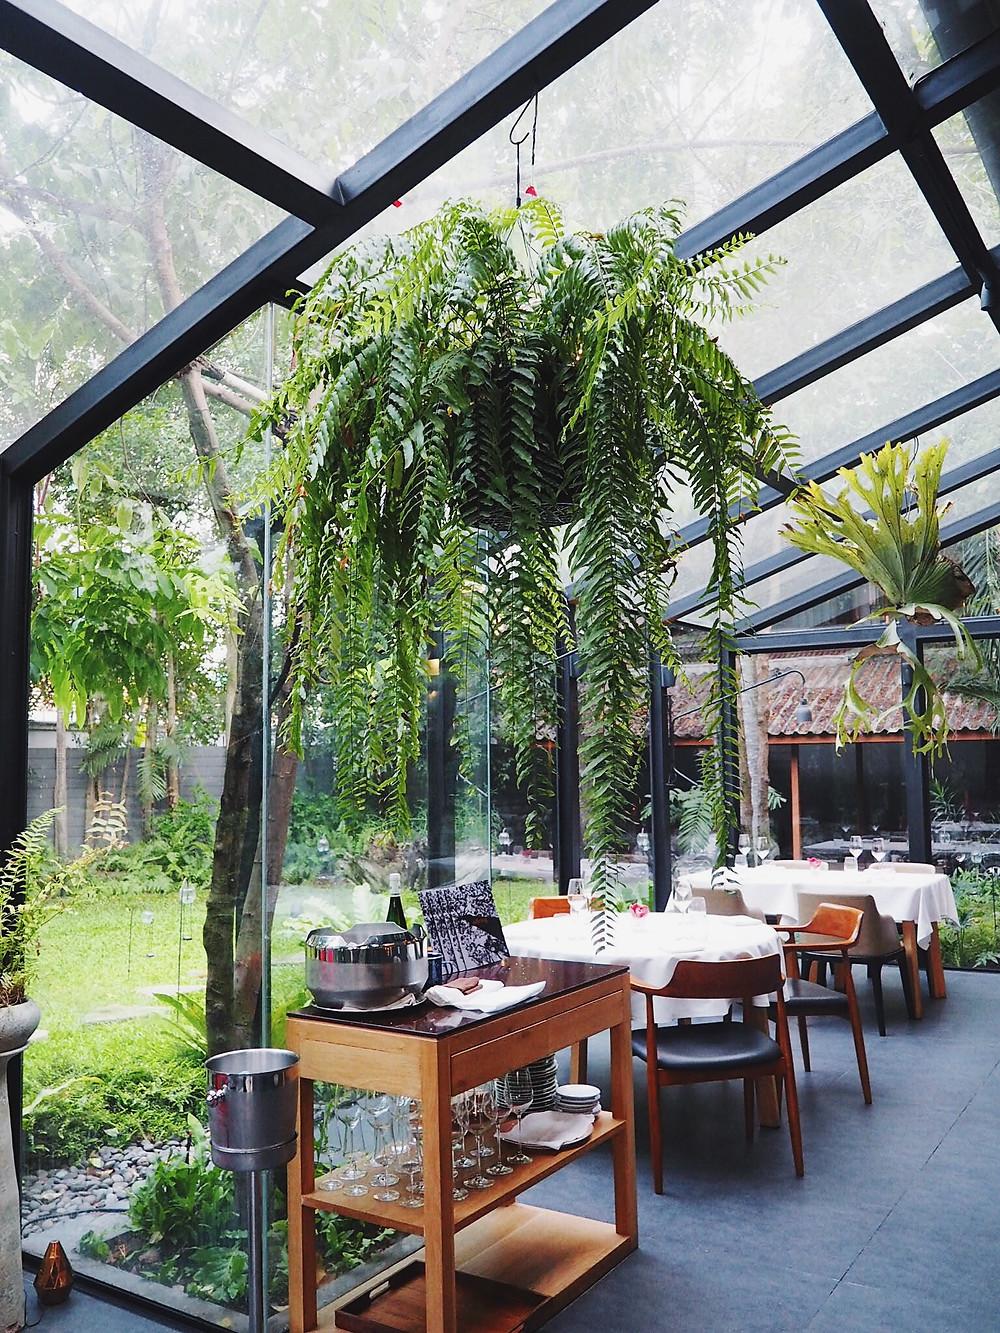 Suhring Bangkok, Thailand | Wintergarten